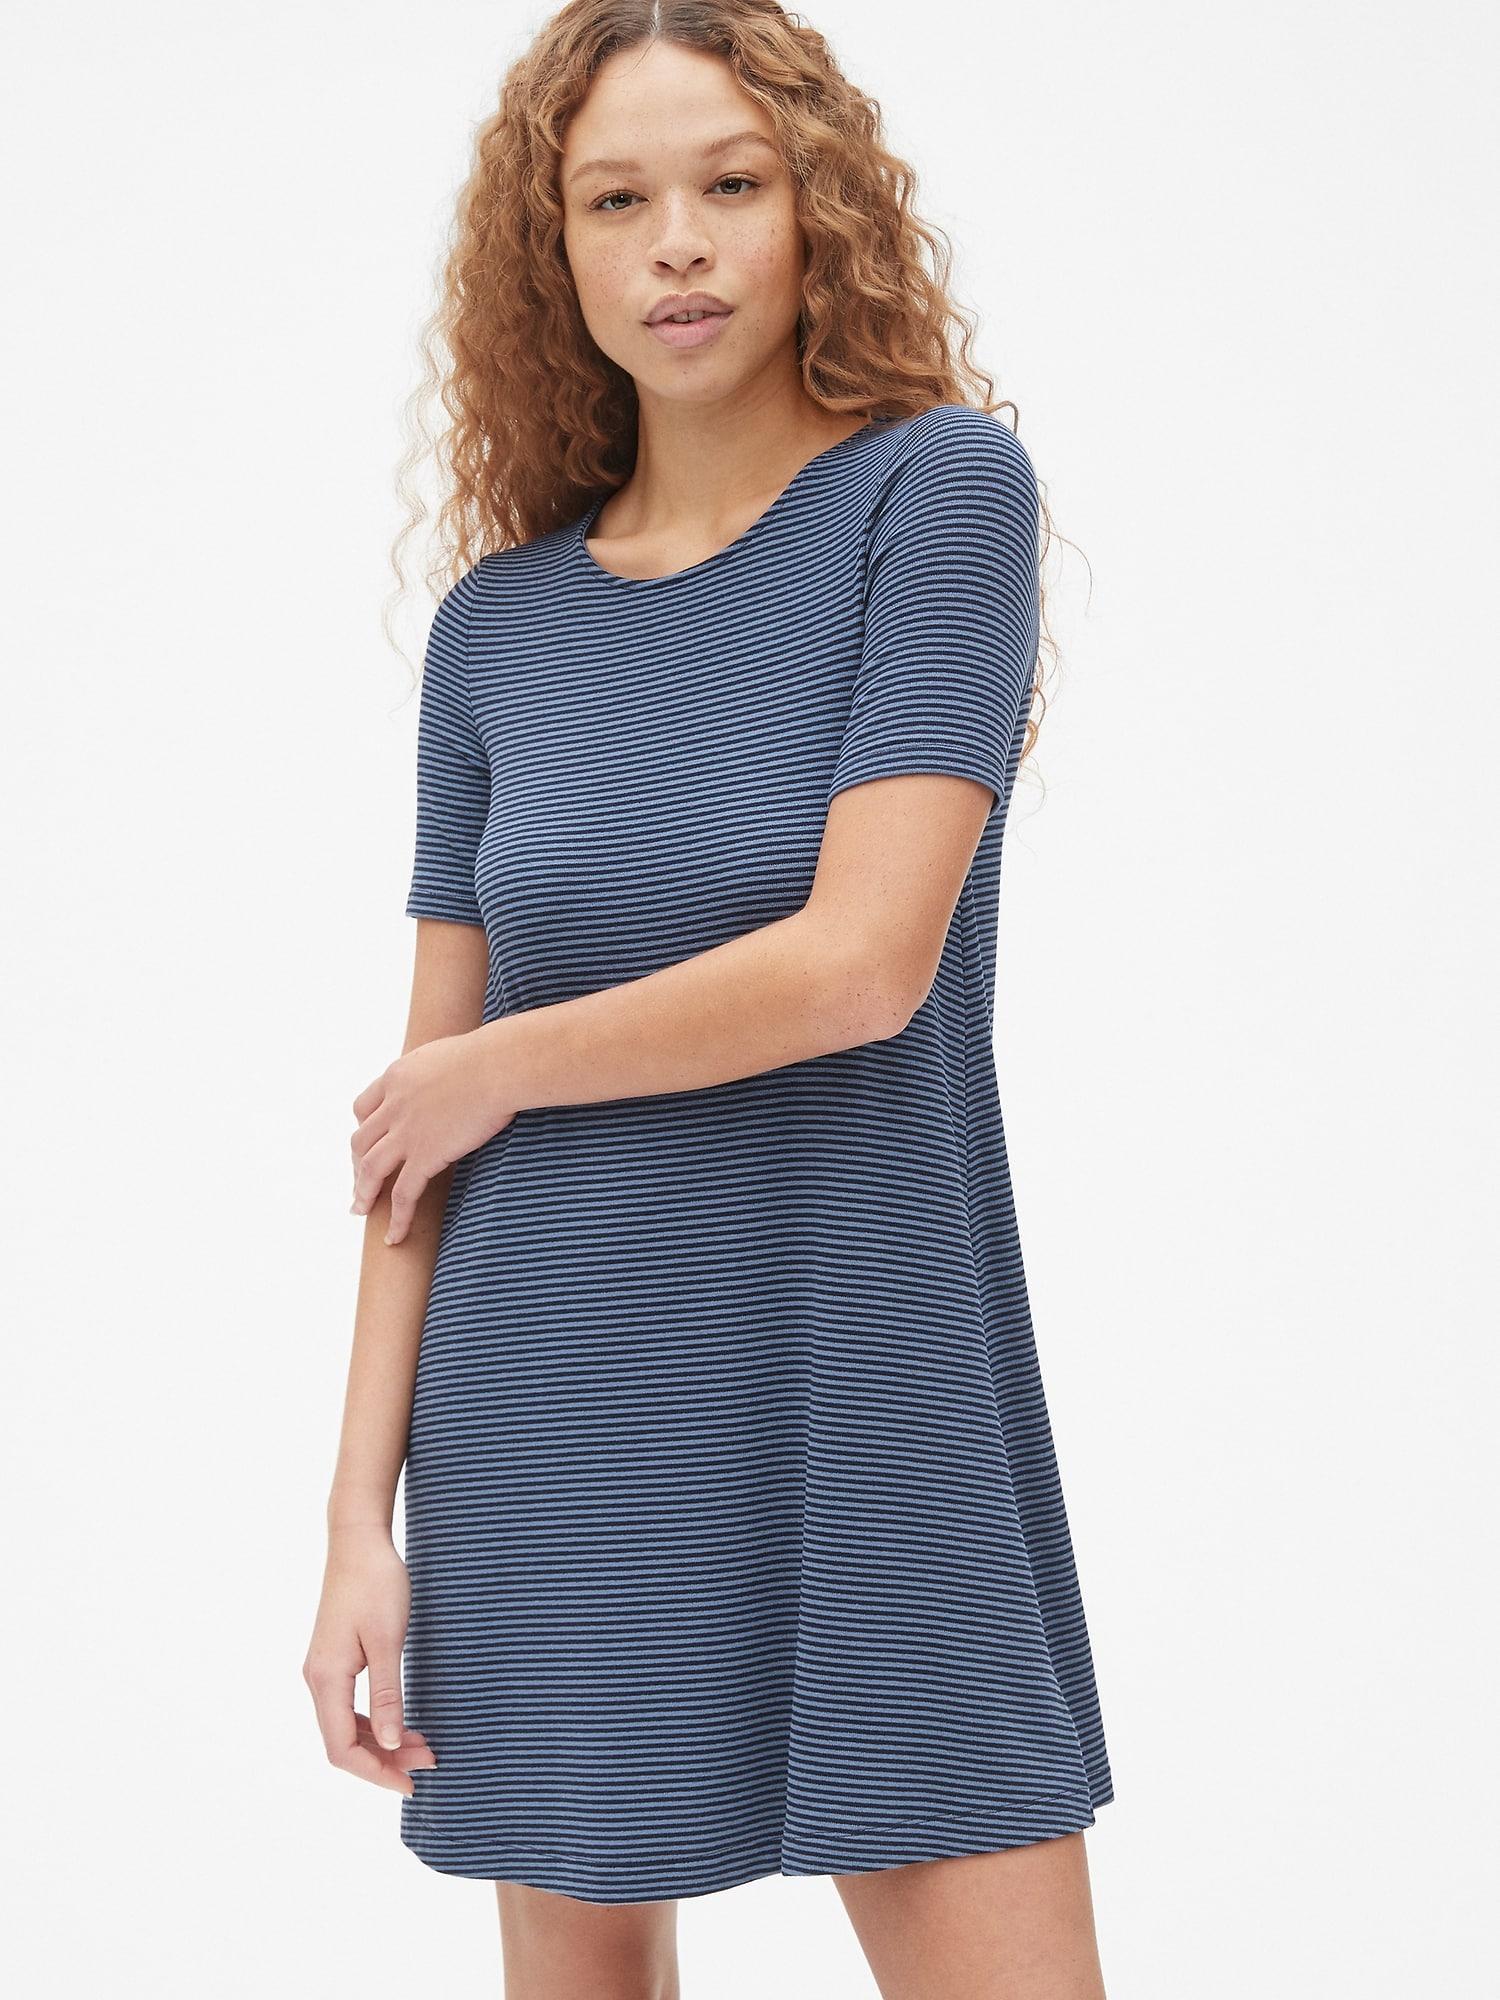 54c7a9964715 Lyst - Gap Softspun Stripe Short Sleeve Swing Dress in Blue